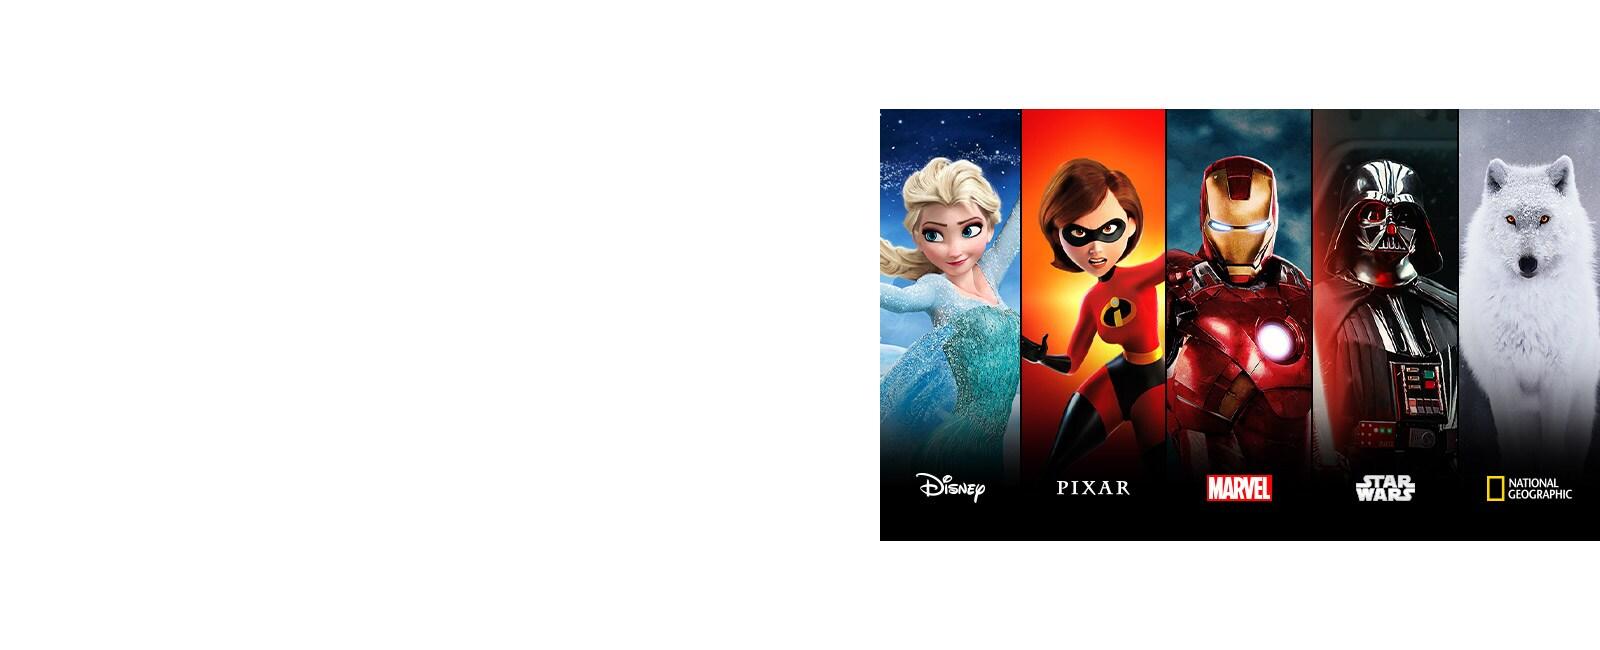 LG OLED77GXPTA Disney+